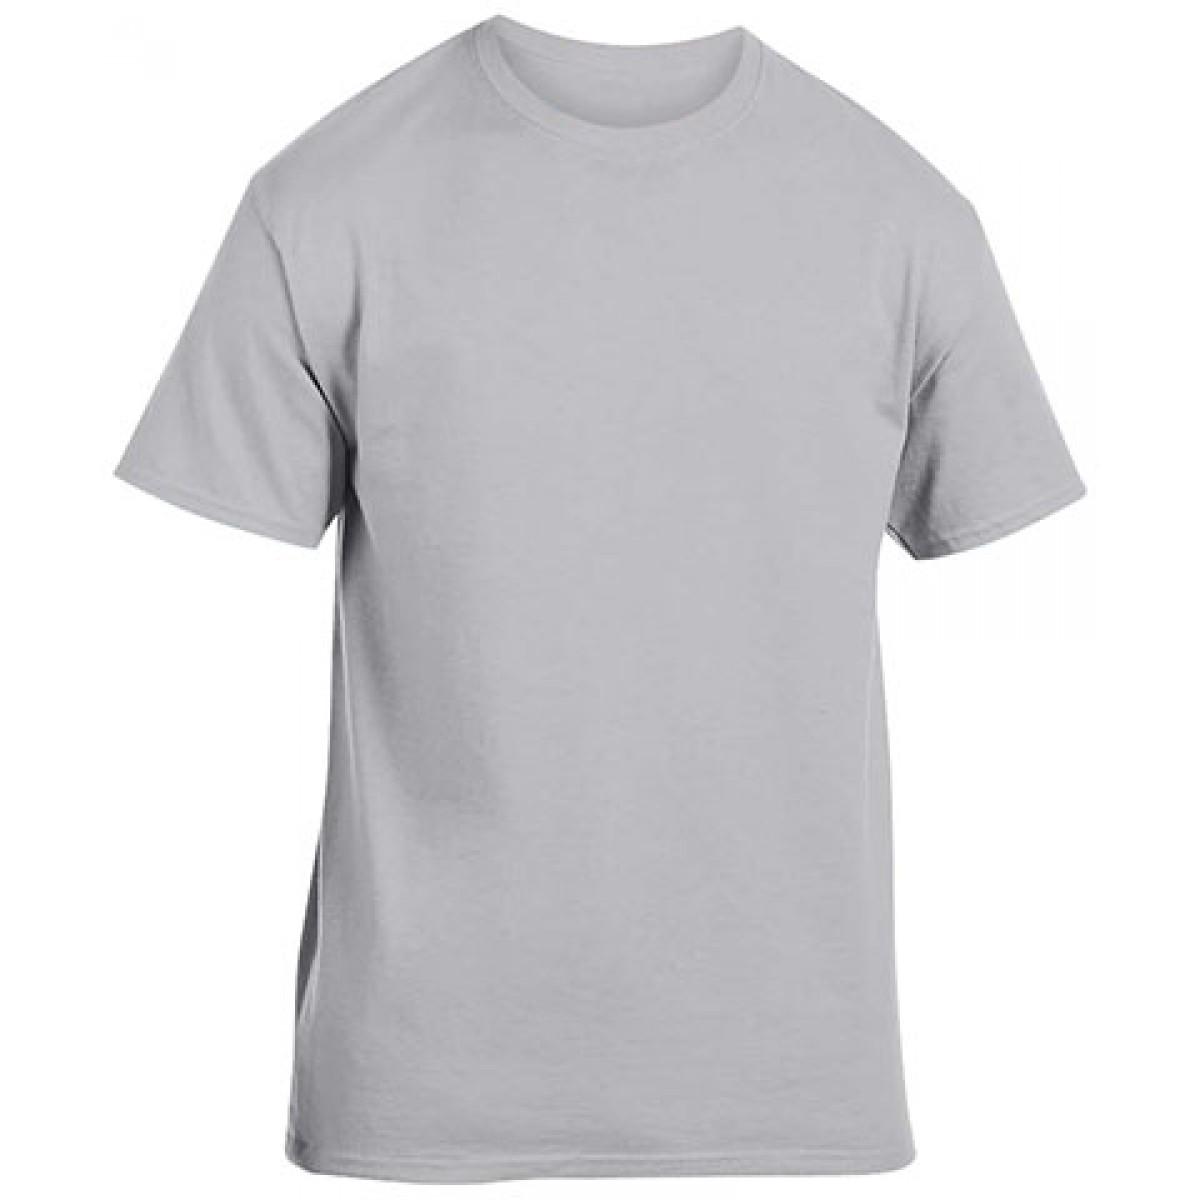 Cotton Short Sleeve T-Shirt-Gray-S